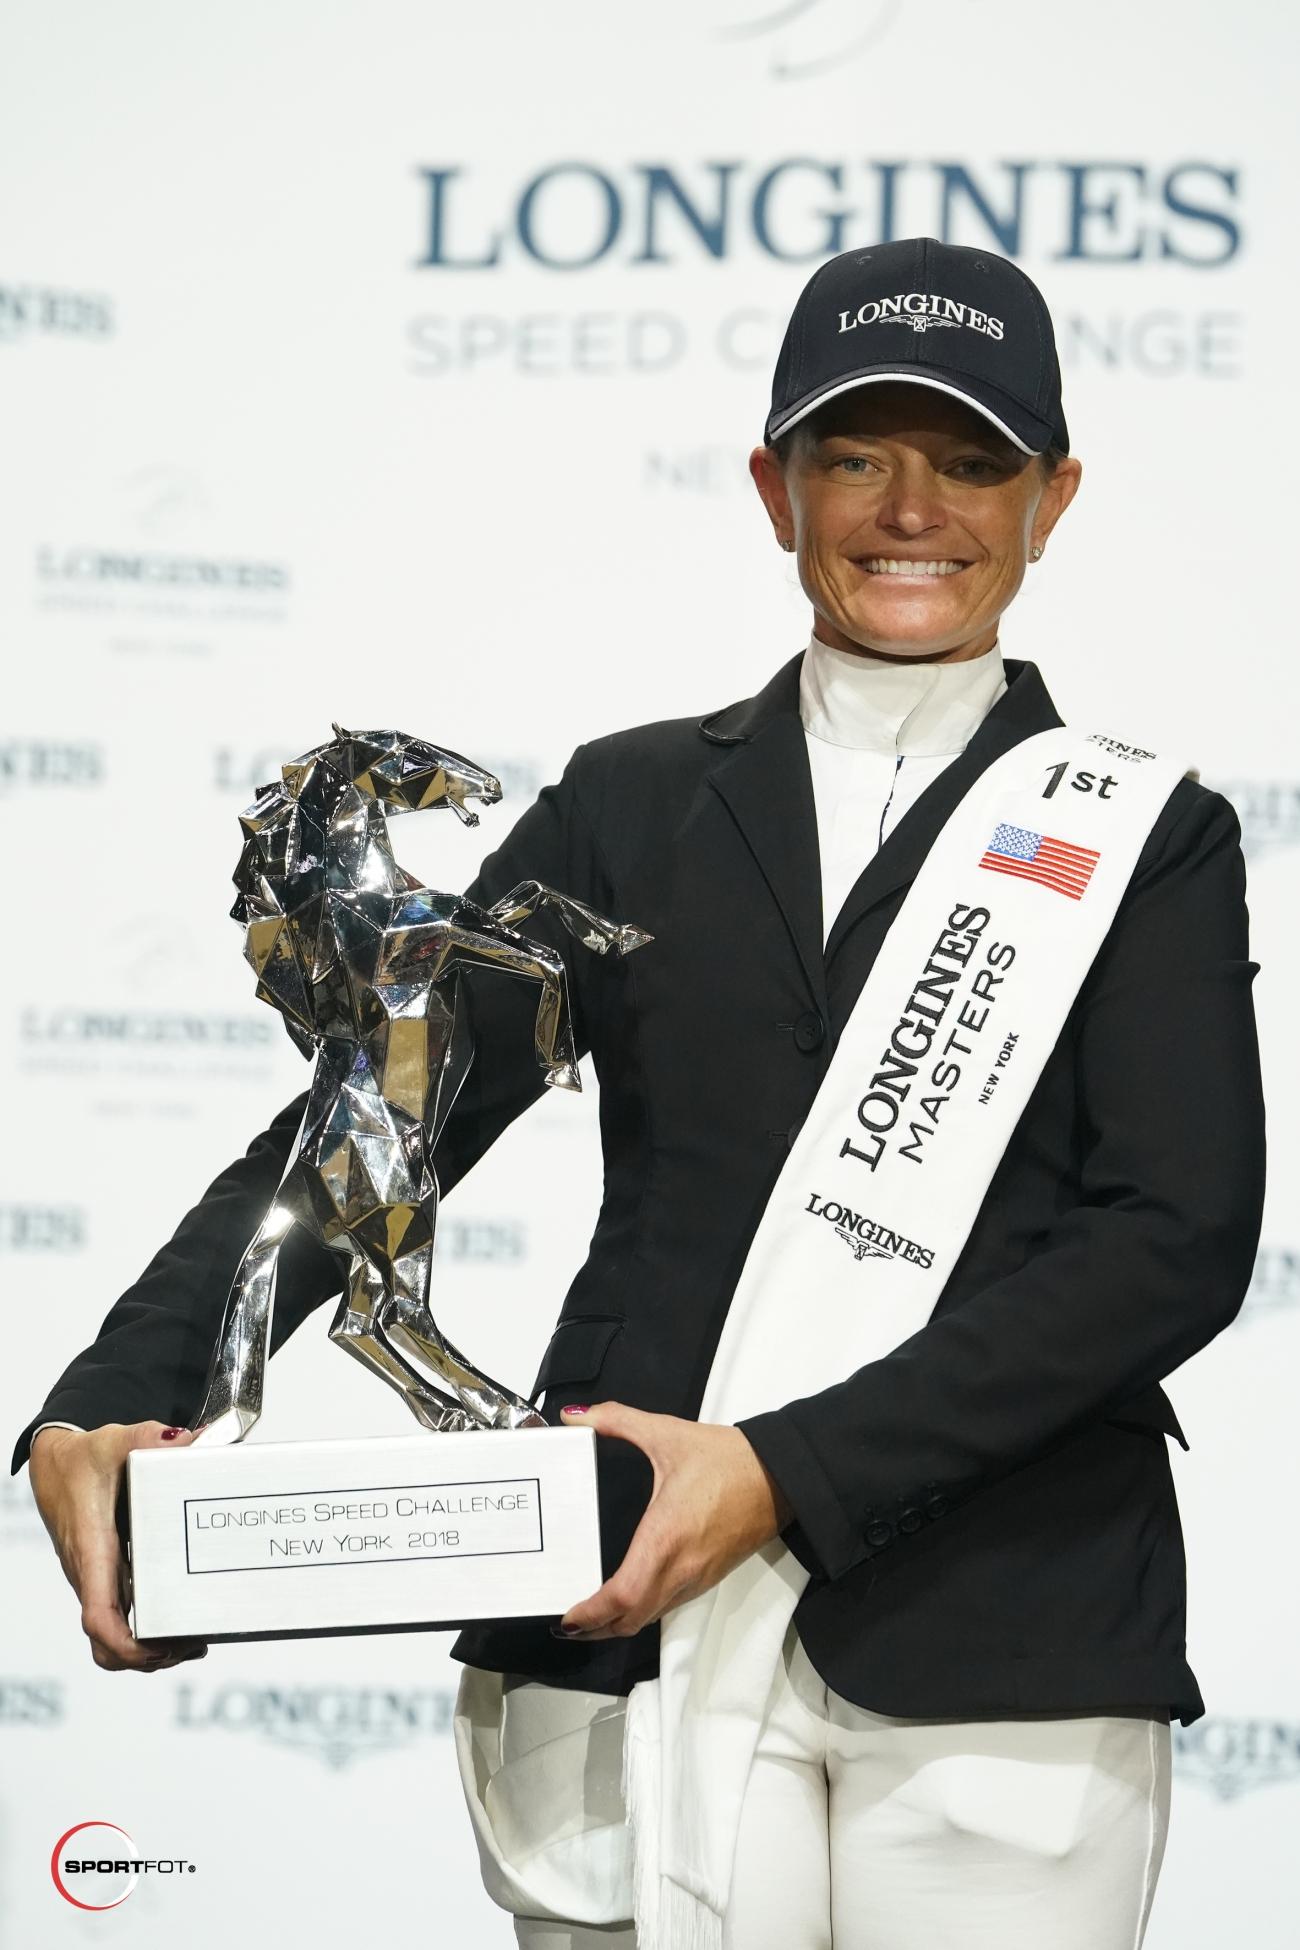 2018.04.28.99.99 Longines Masters NY Speed Challenge Cel Erynn Ballard & Fantast Sportfot